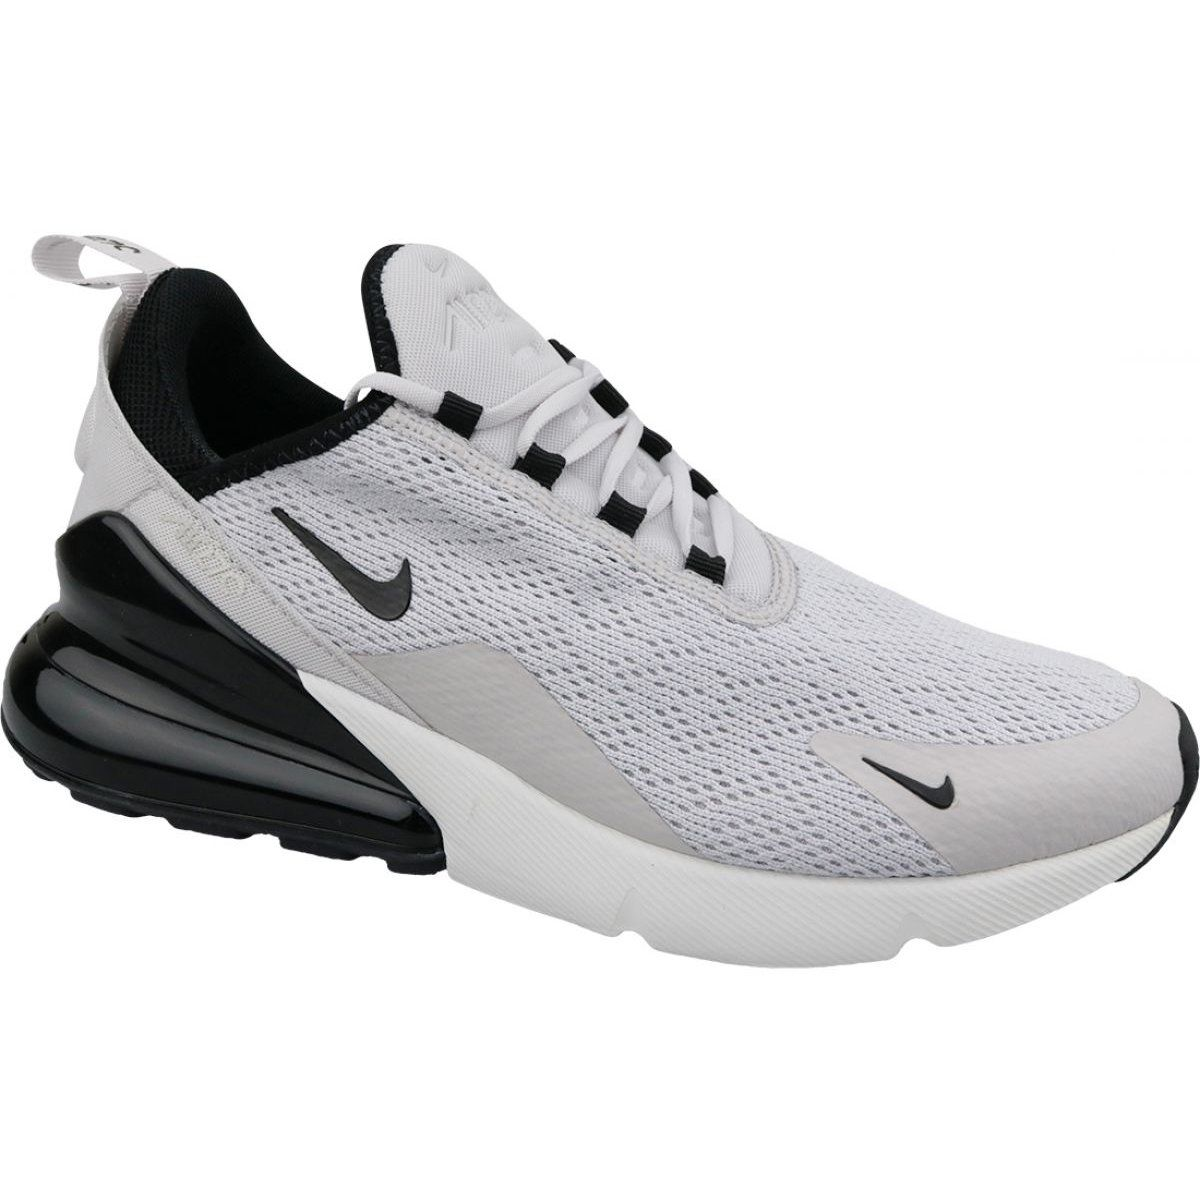 Buty Nike Air Max 270 W AH6789 012 białe w 2019 | Buty, Buty